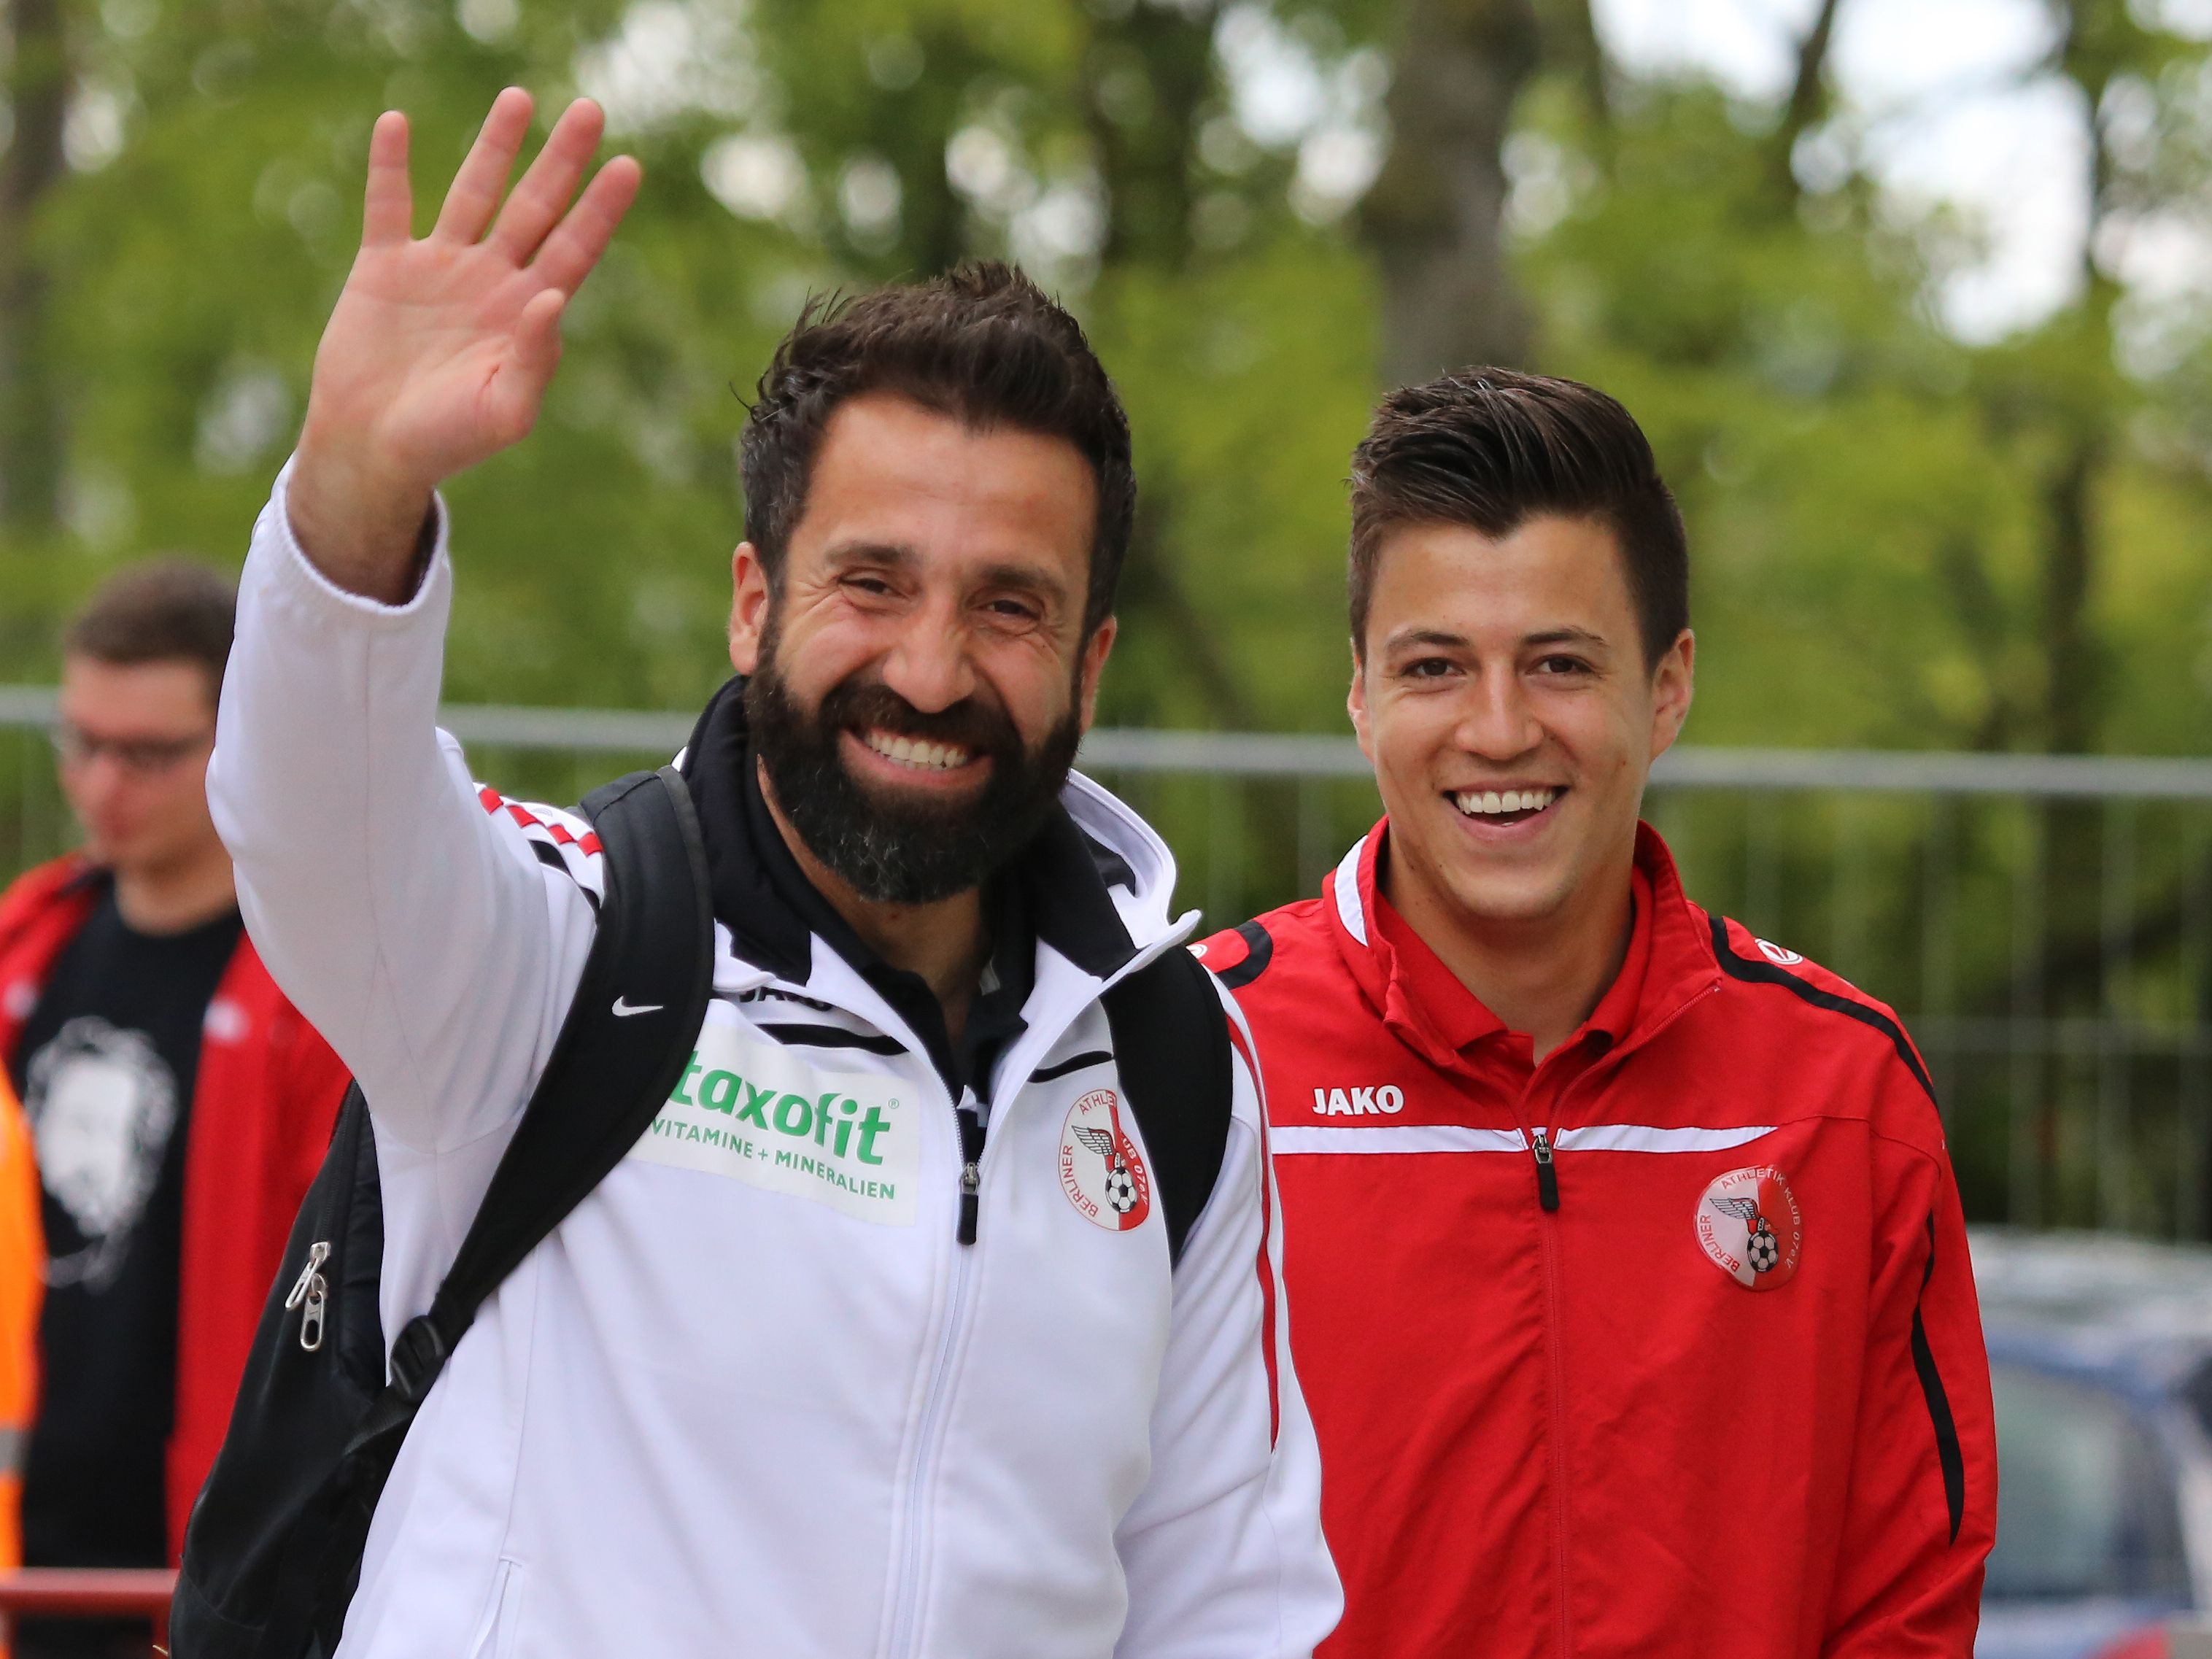 Torwarttrainer #Serkan #Mese & #Christian #Skoda in bester Laune.